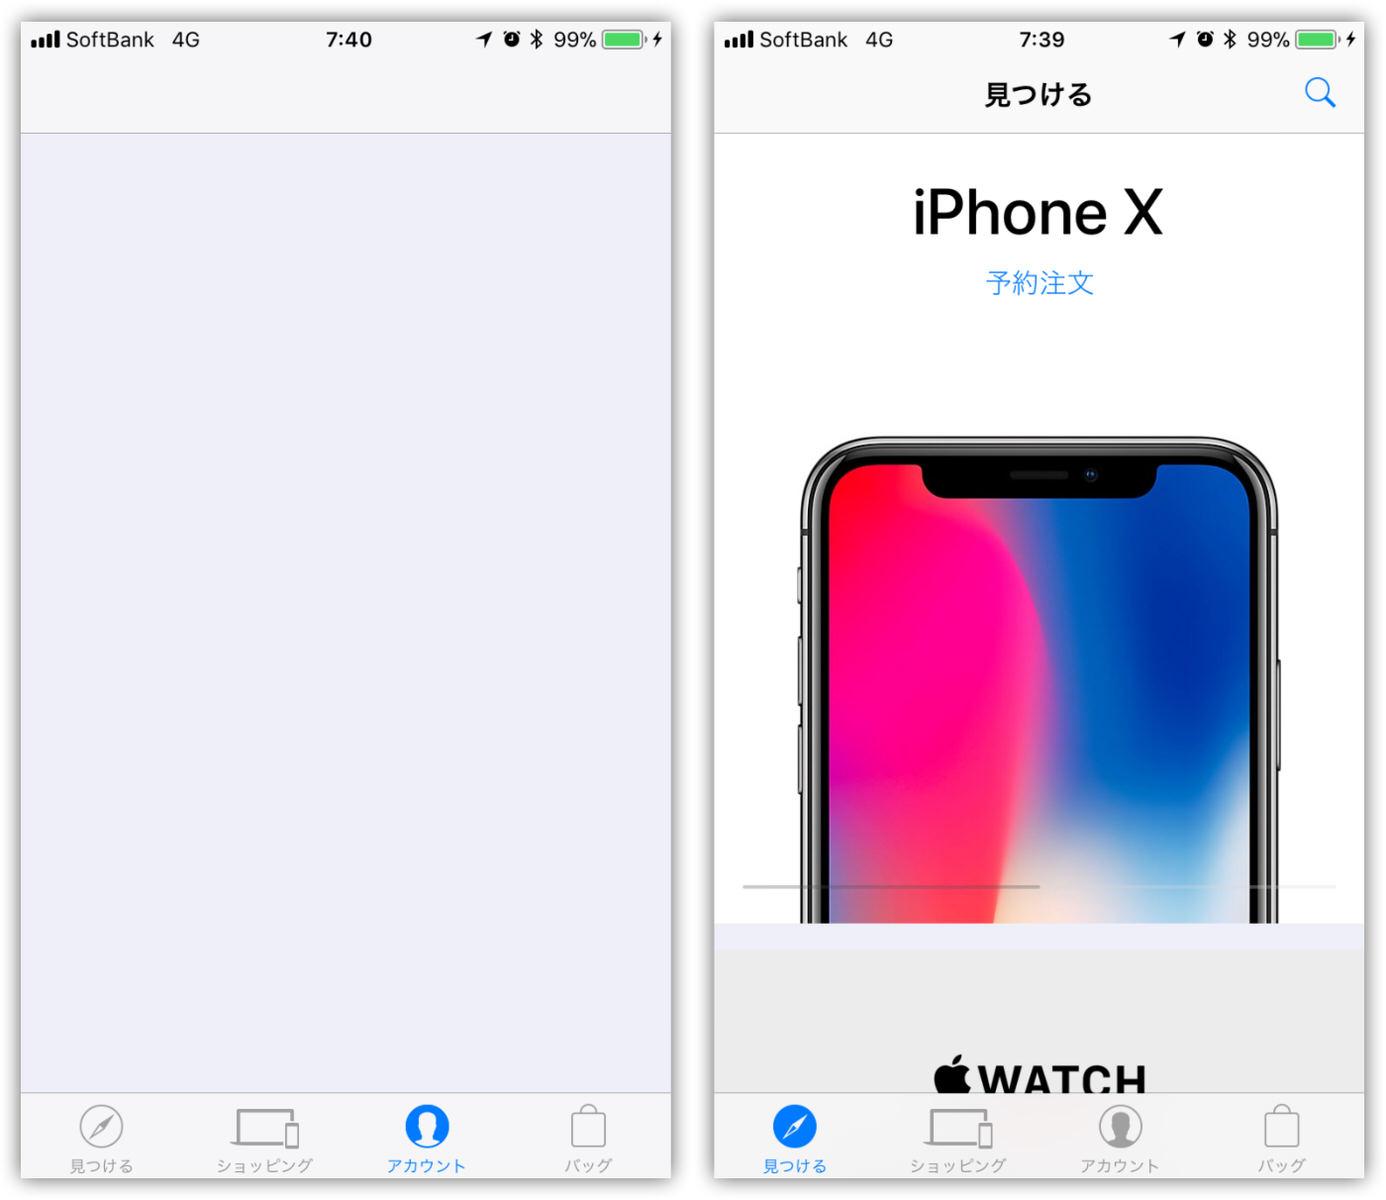 iPhone X 出荷準備中-2